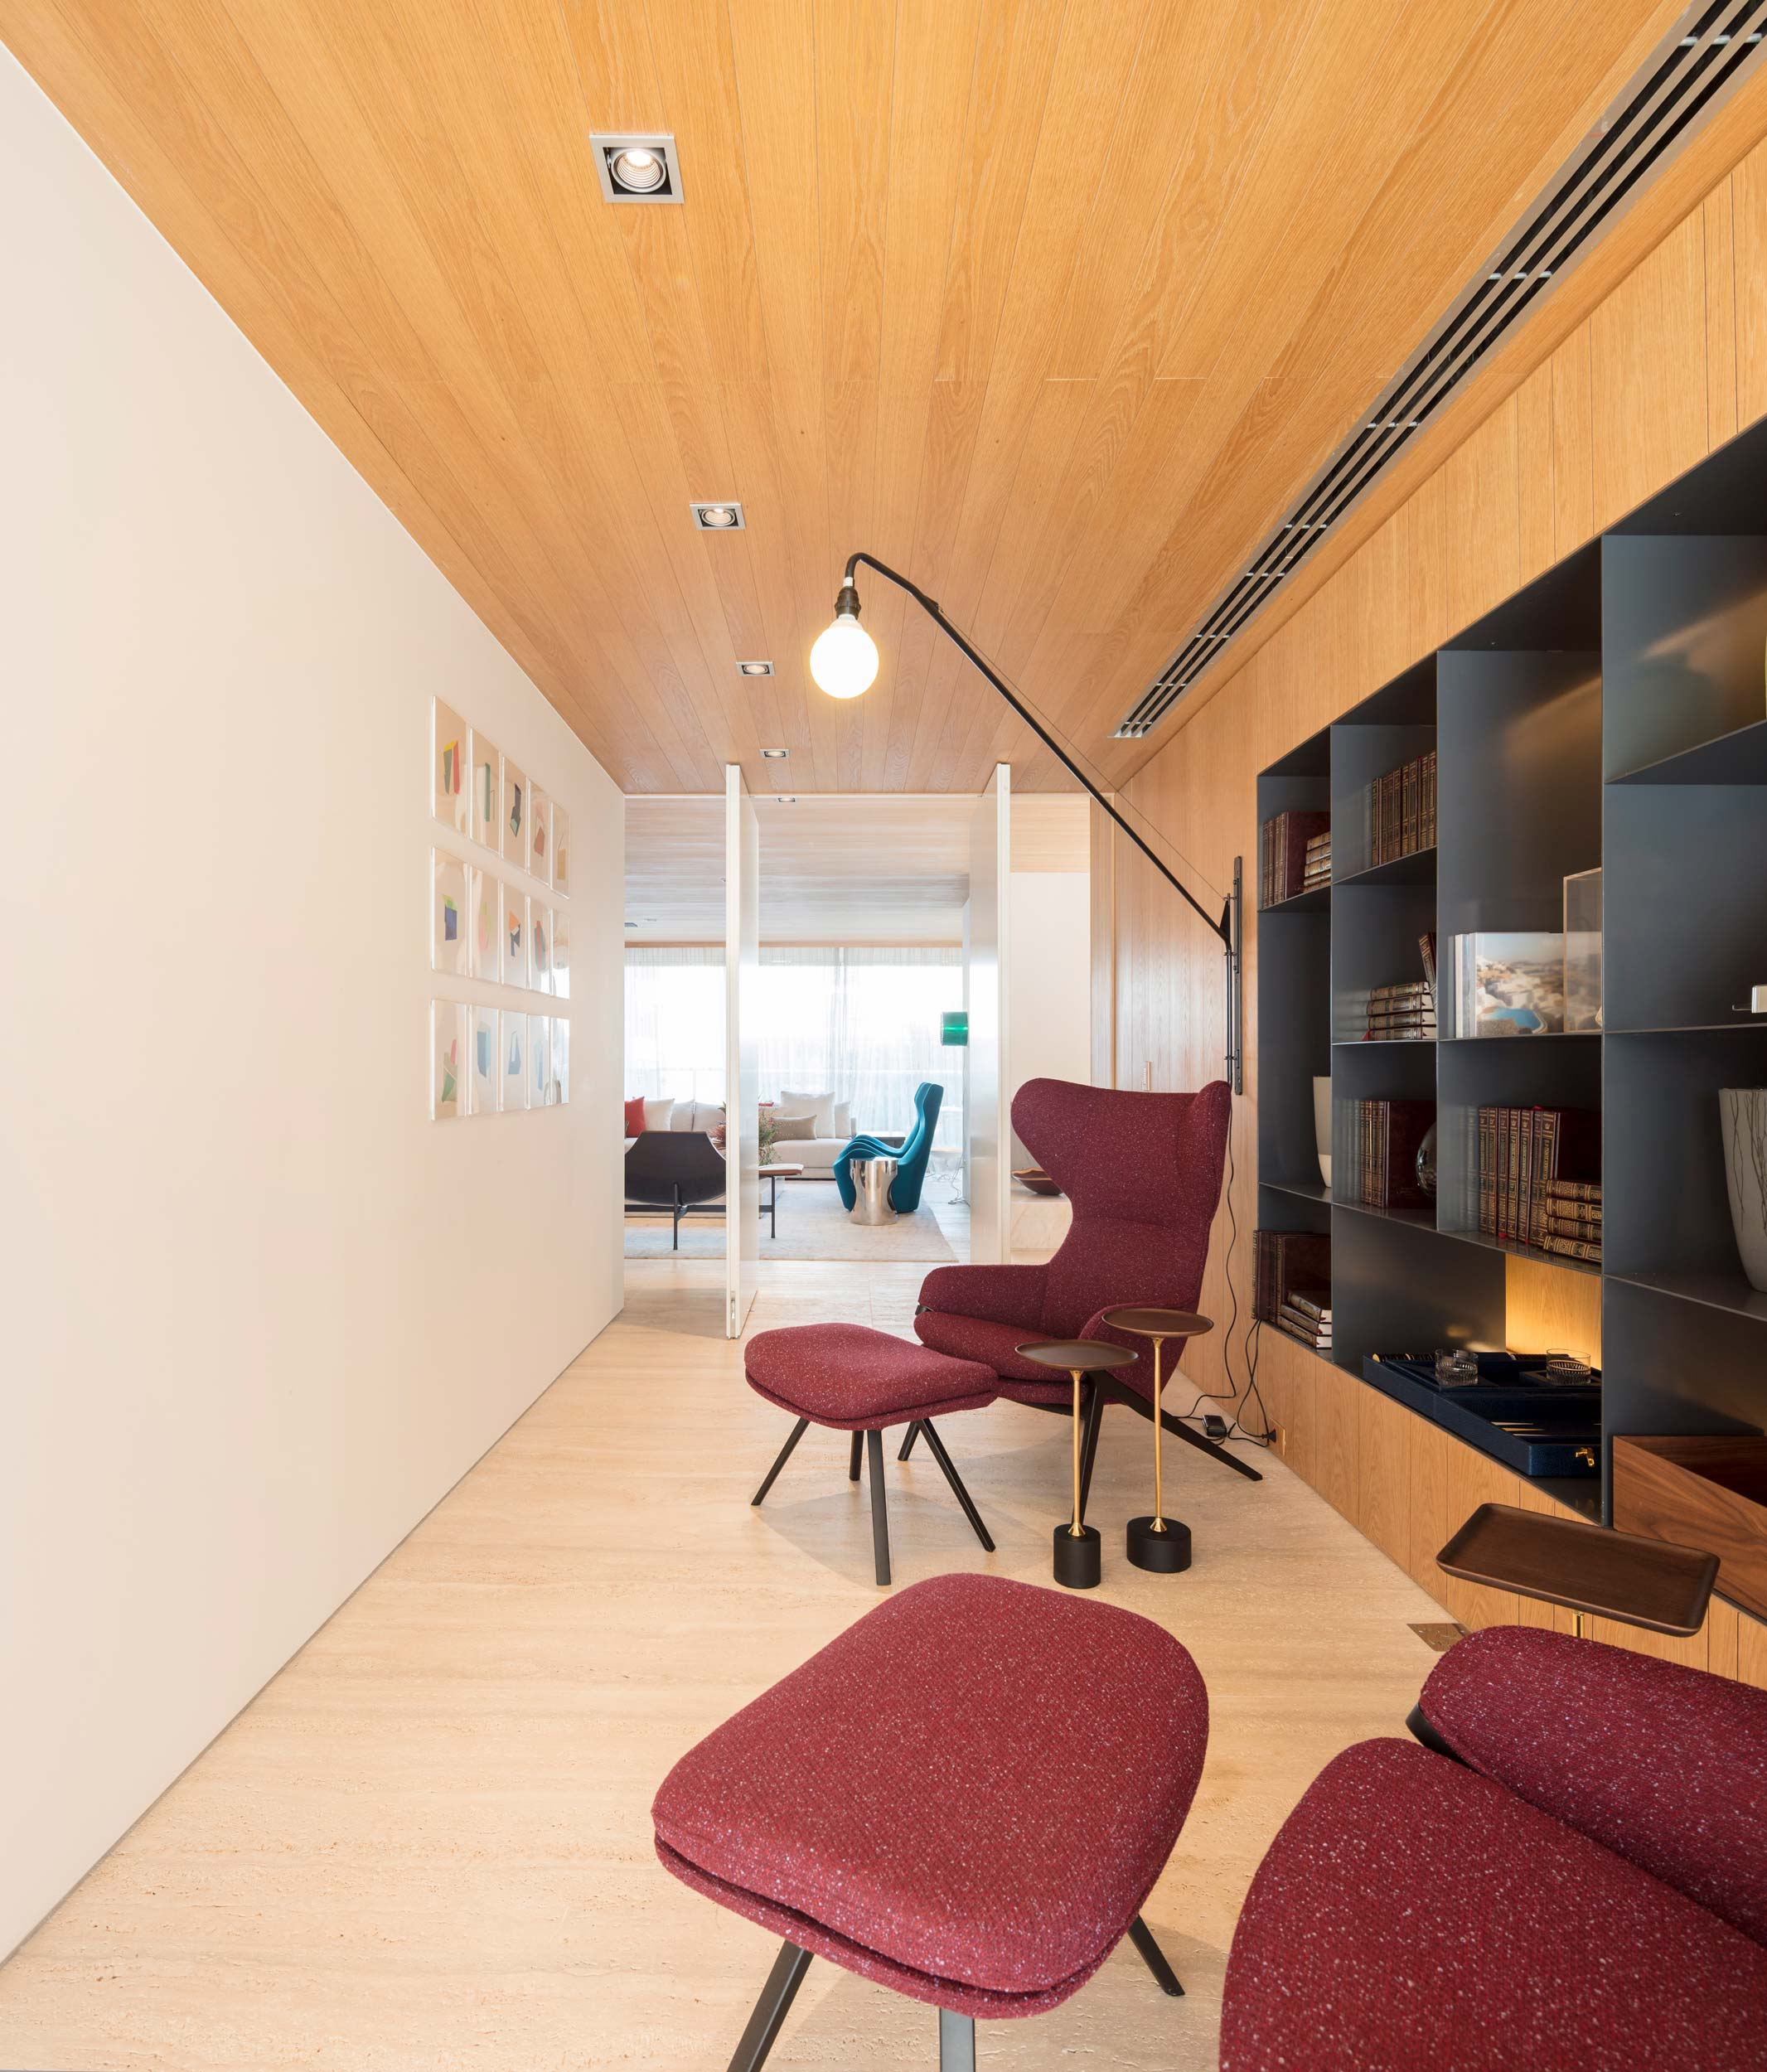 projeto-eretz-fernanda-marques-arquiteta-1.JPG